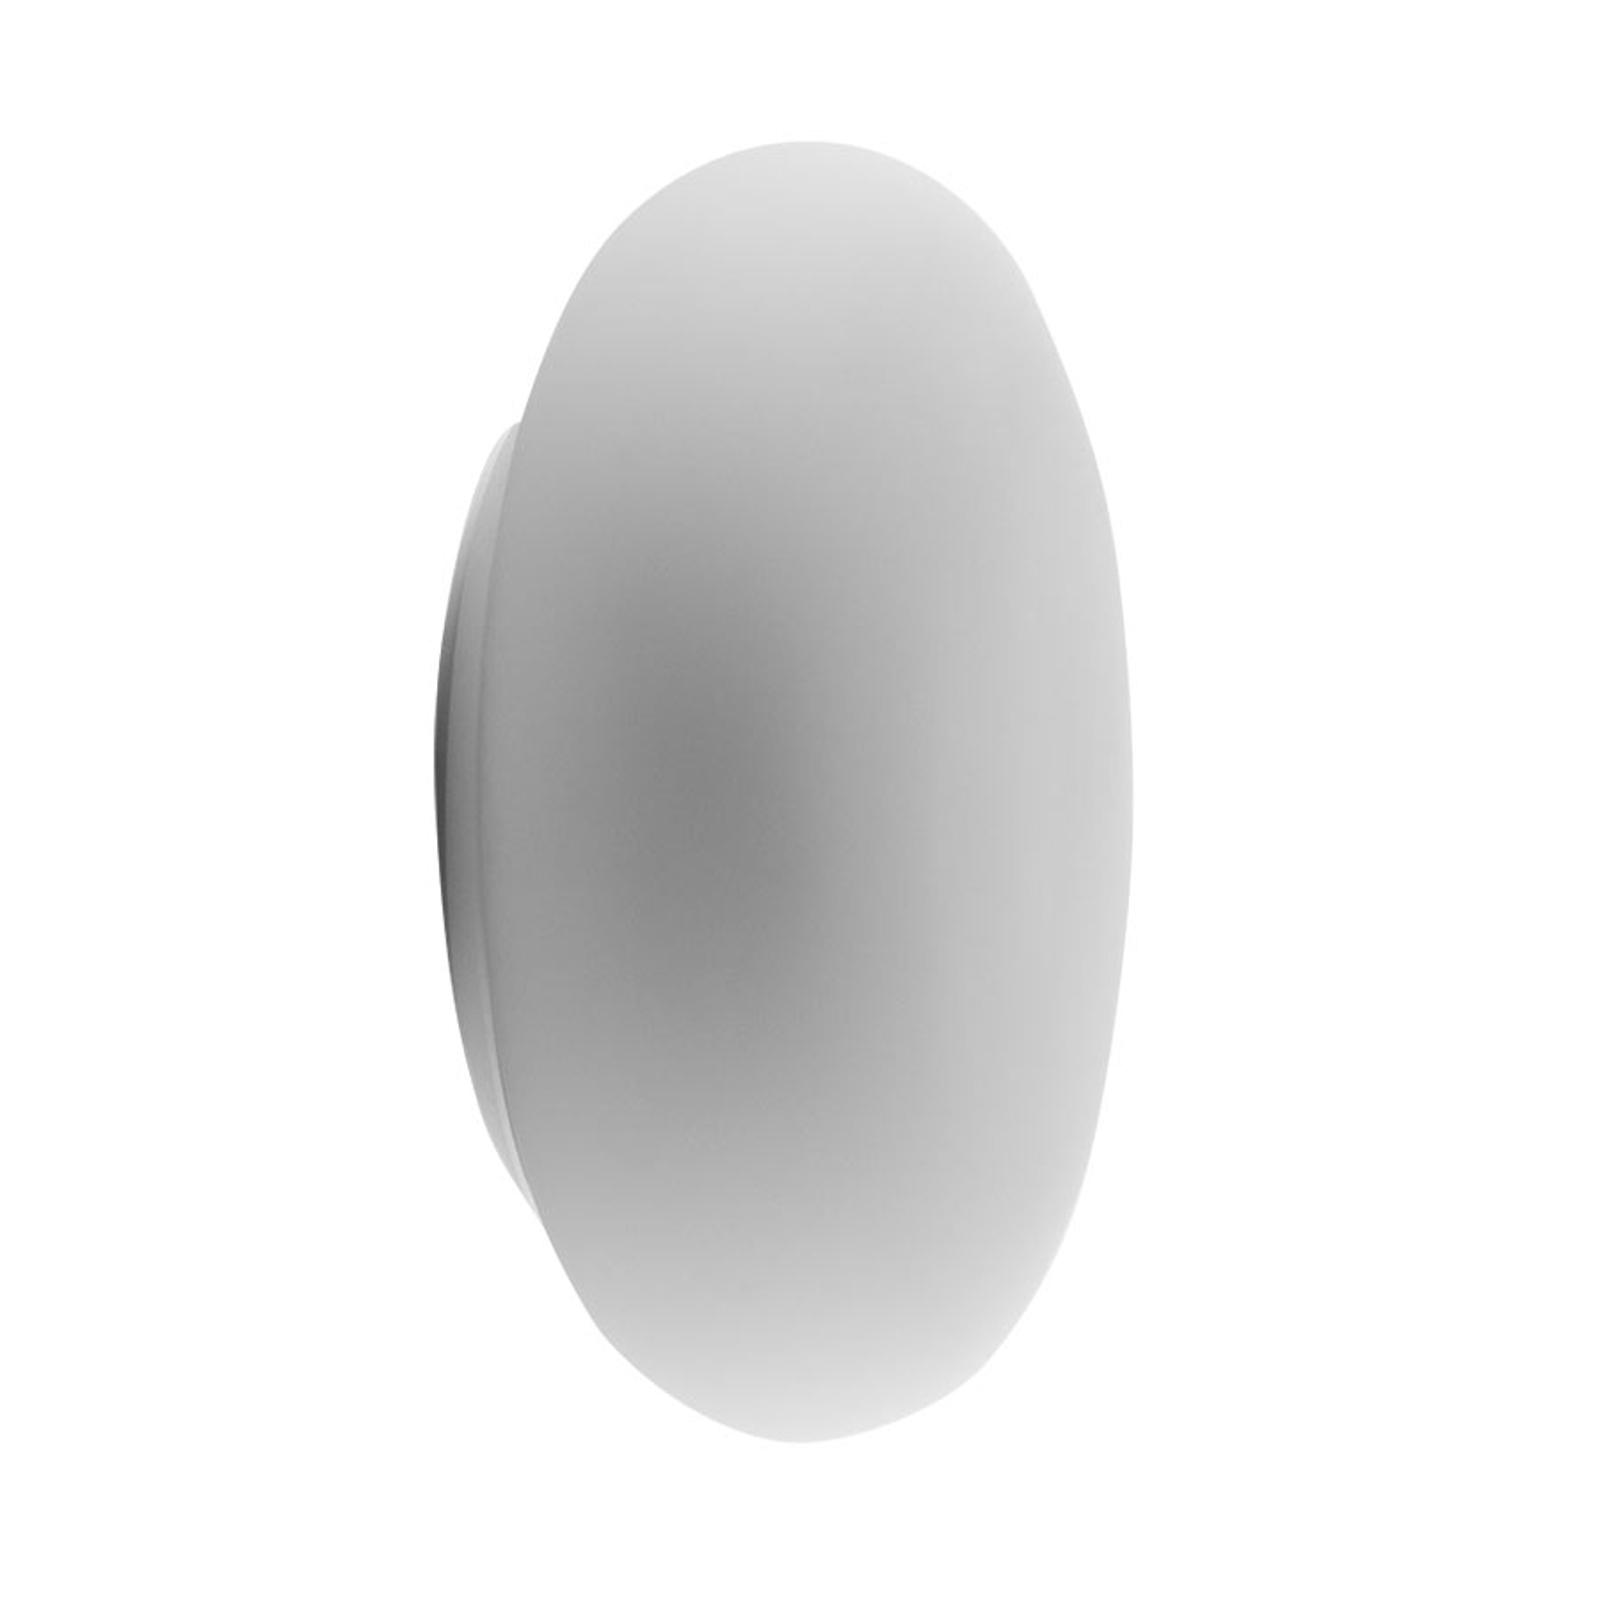 Artemide Itka Glas-Wandleuchte IP65 Ø 35 cm